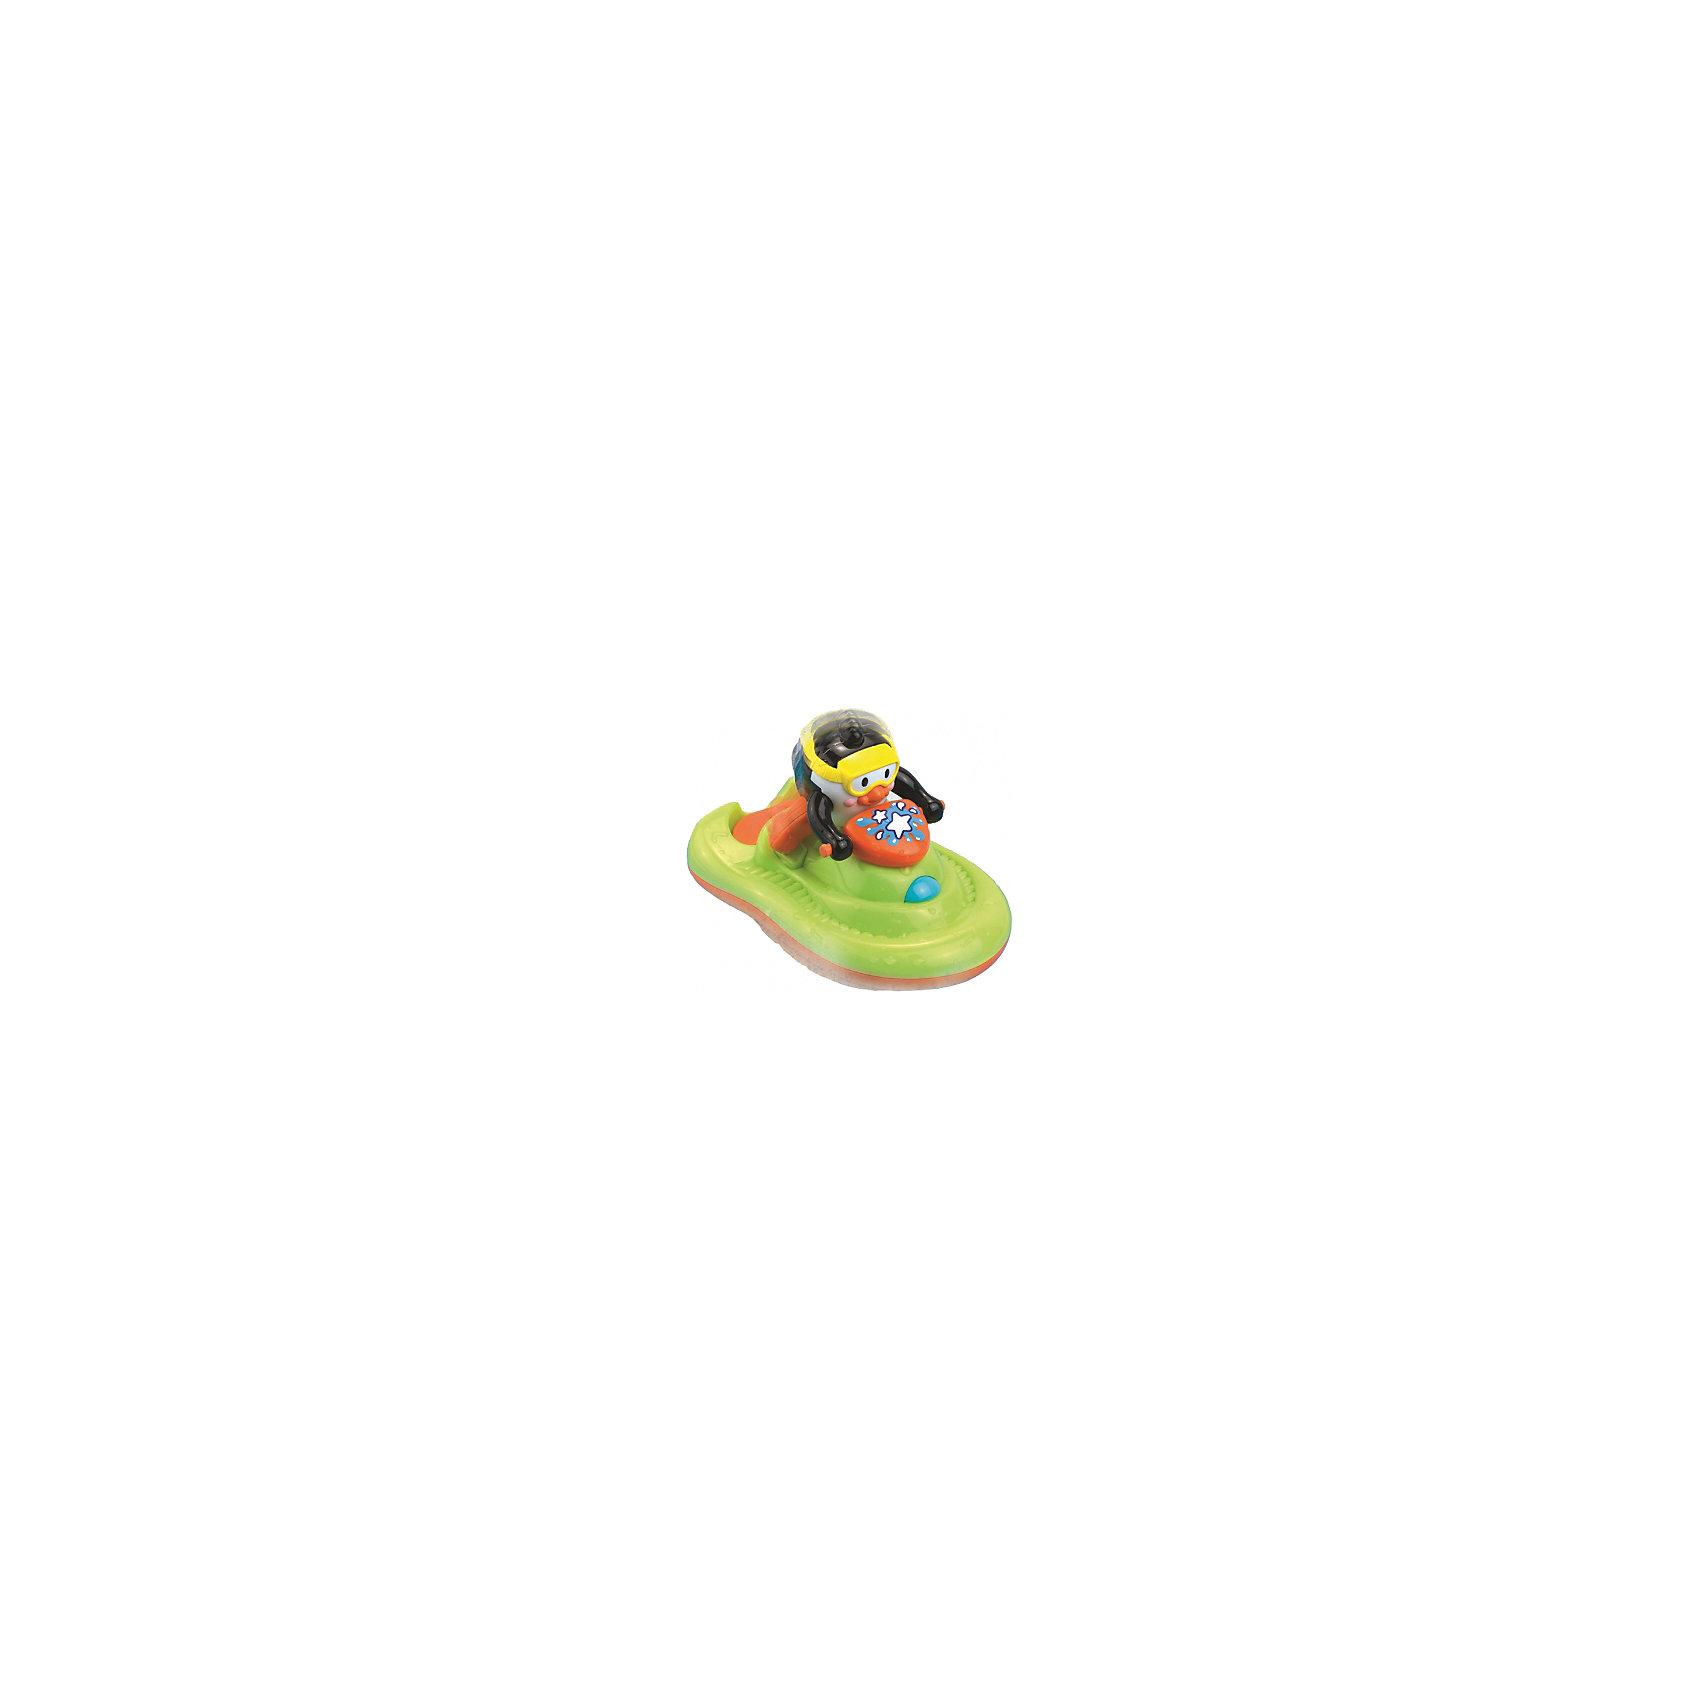 Пингвиненок на катере, HAP-P-KID